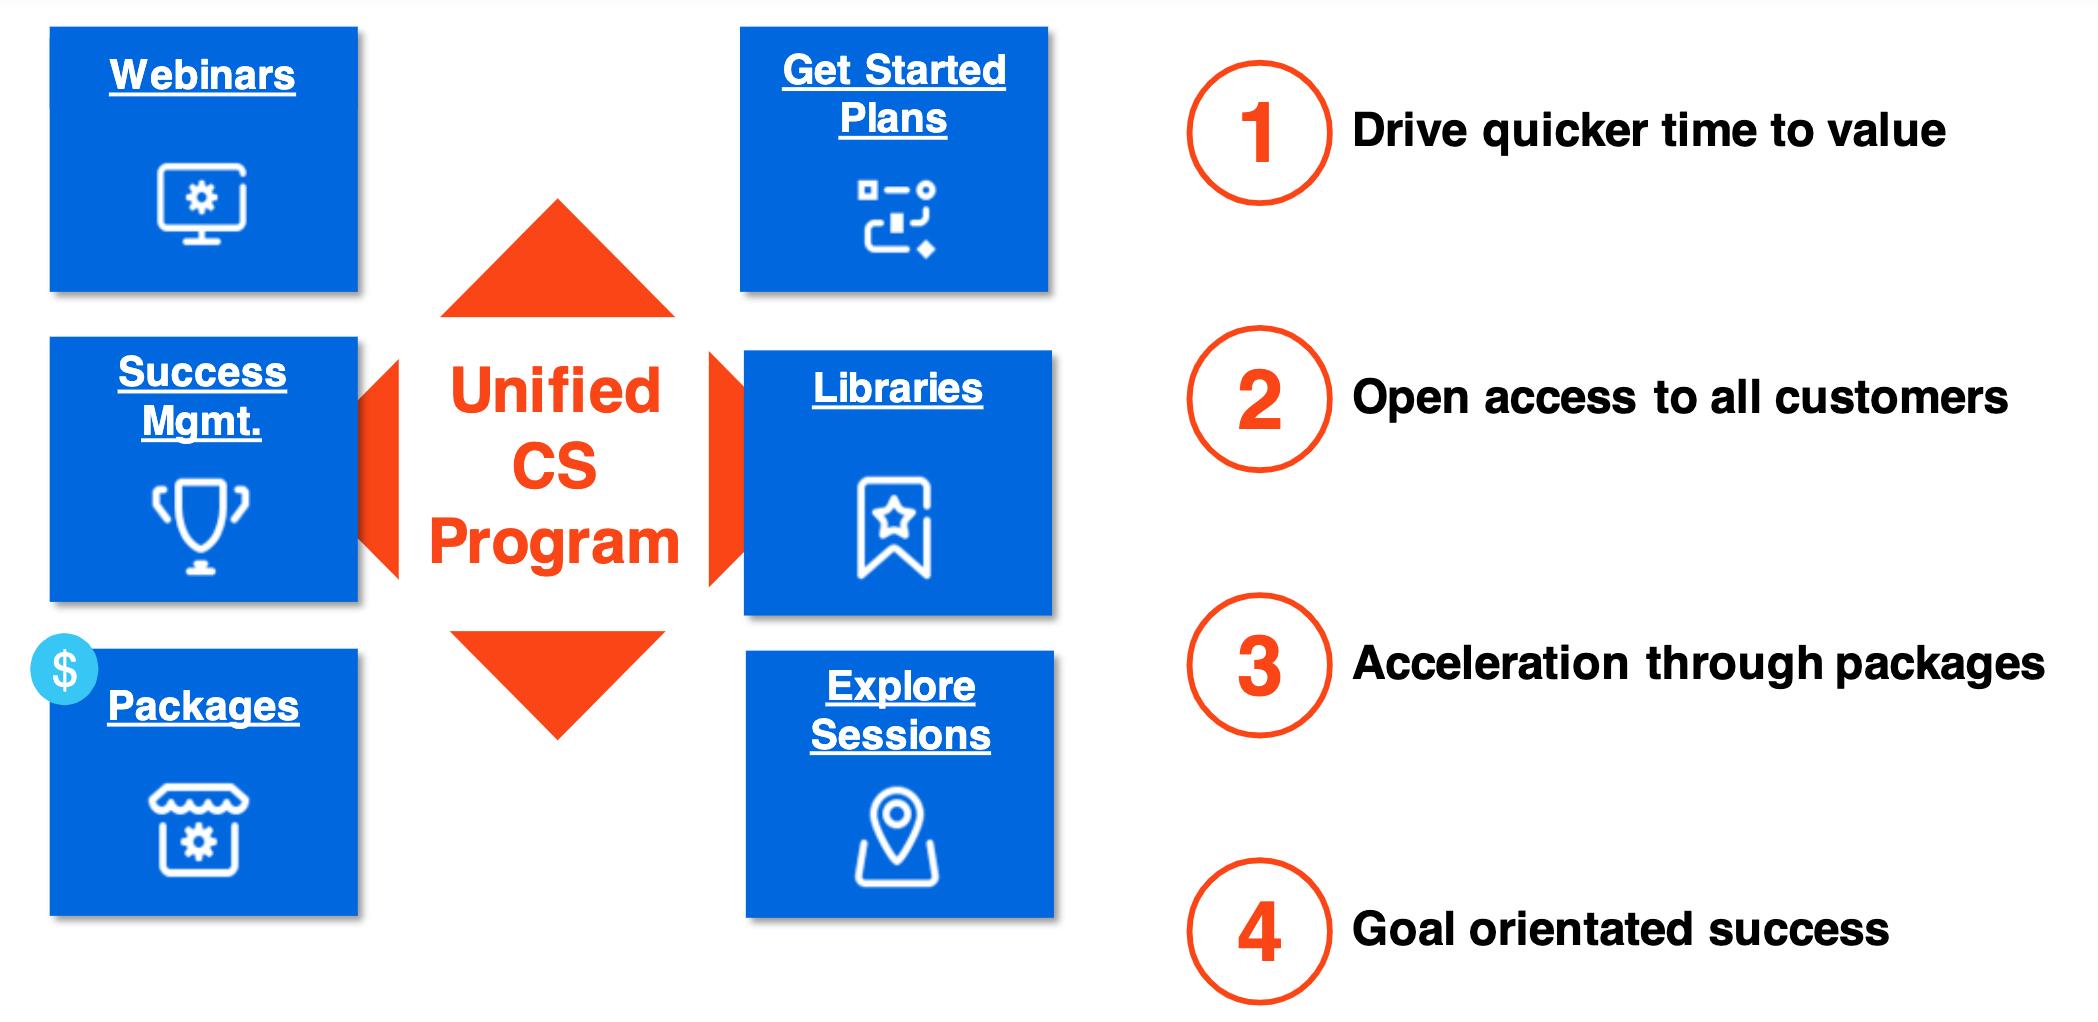 uipath unified customer success program new 2020